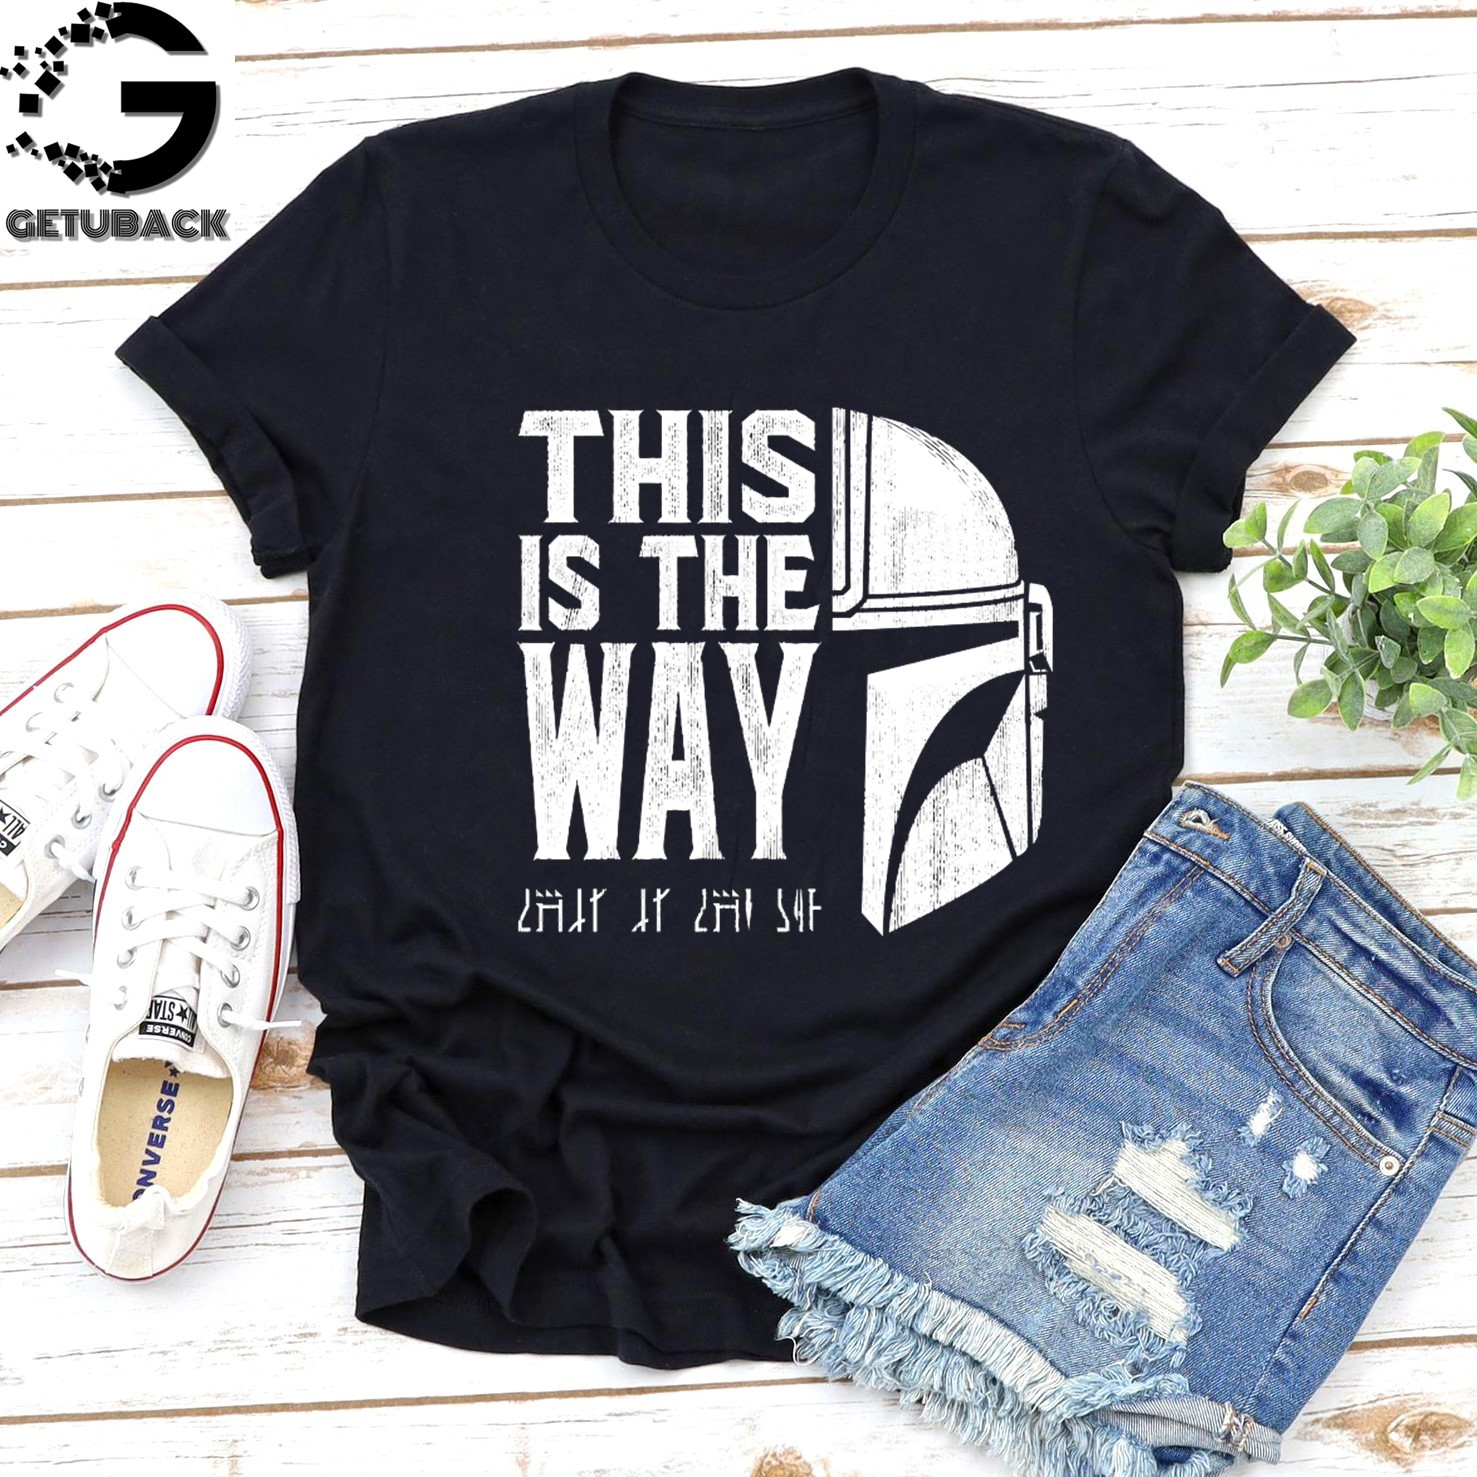 Women's The Mandalorian Child Baby Yoda Print T-Shirt Fashion Kawaii Girl Short Sleeve Tshirt Female Hipster Clothes